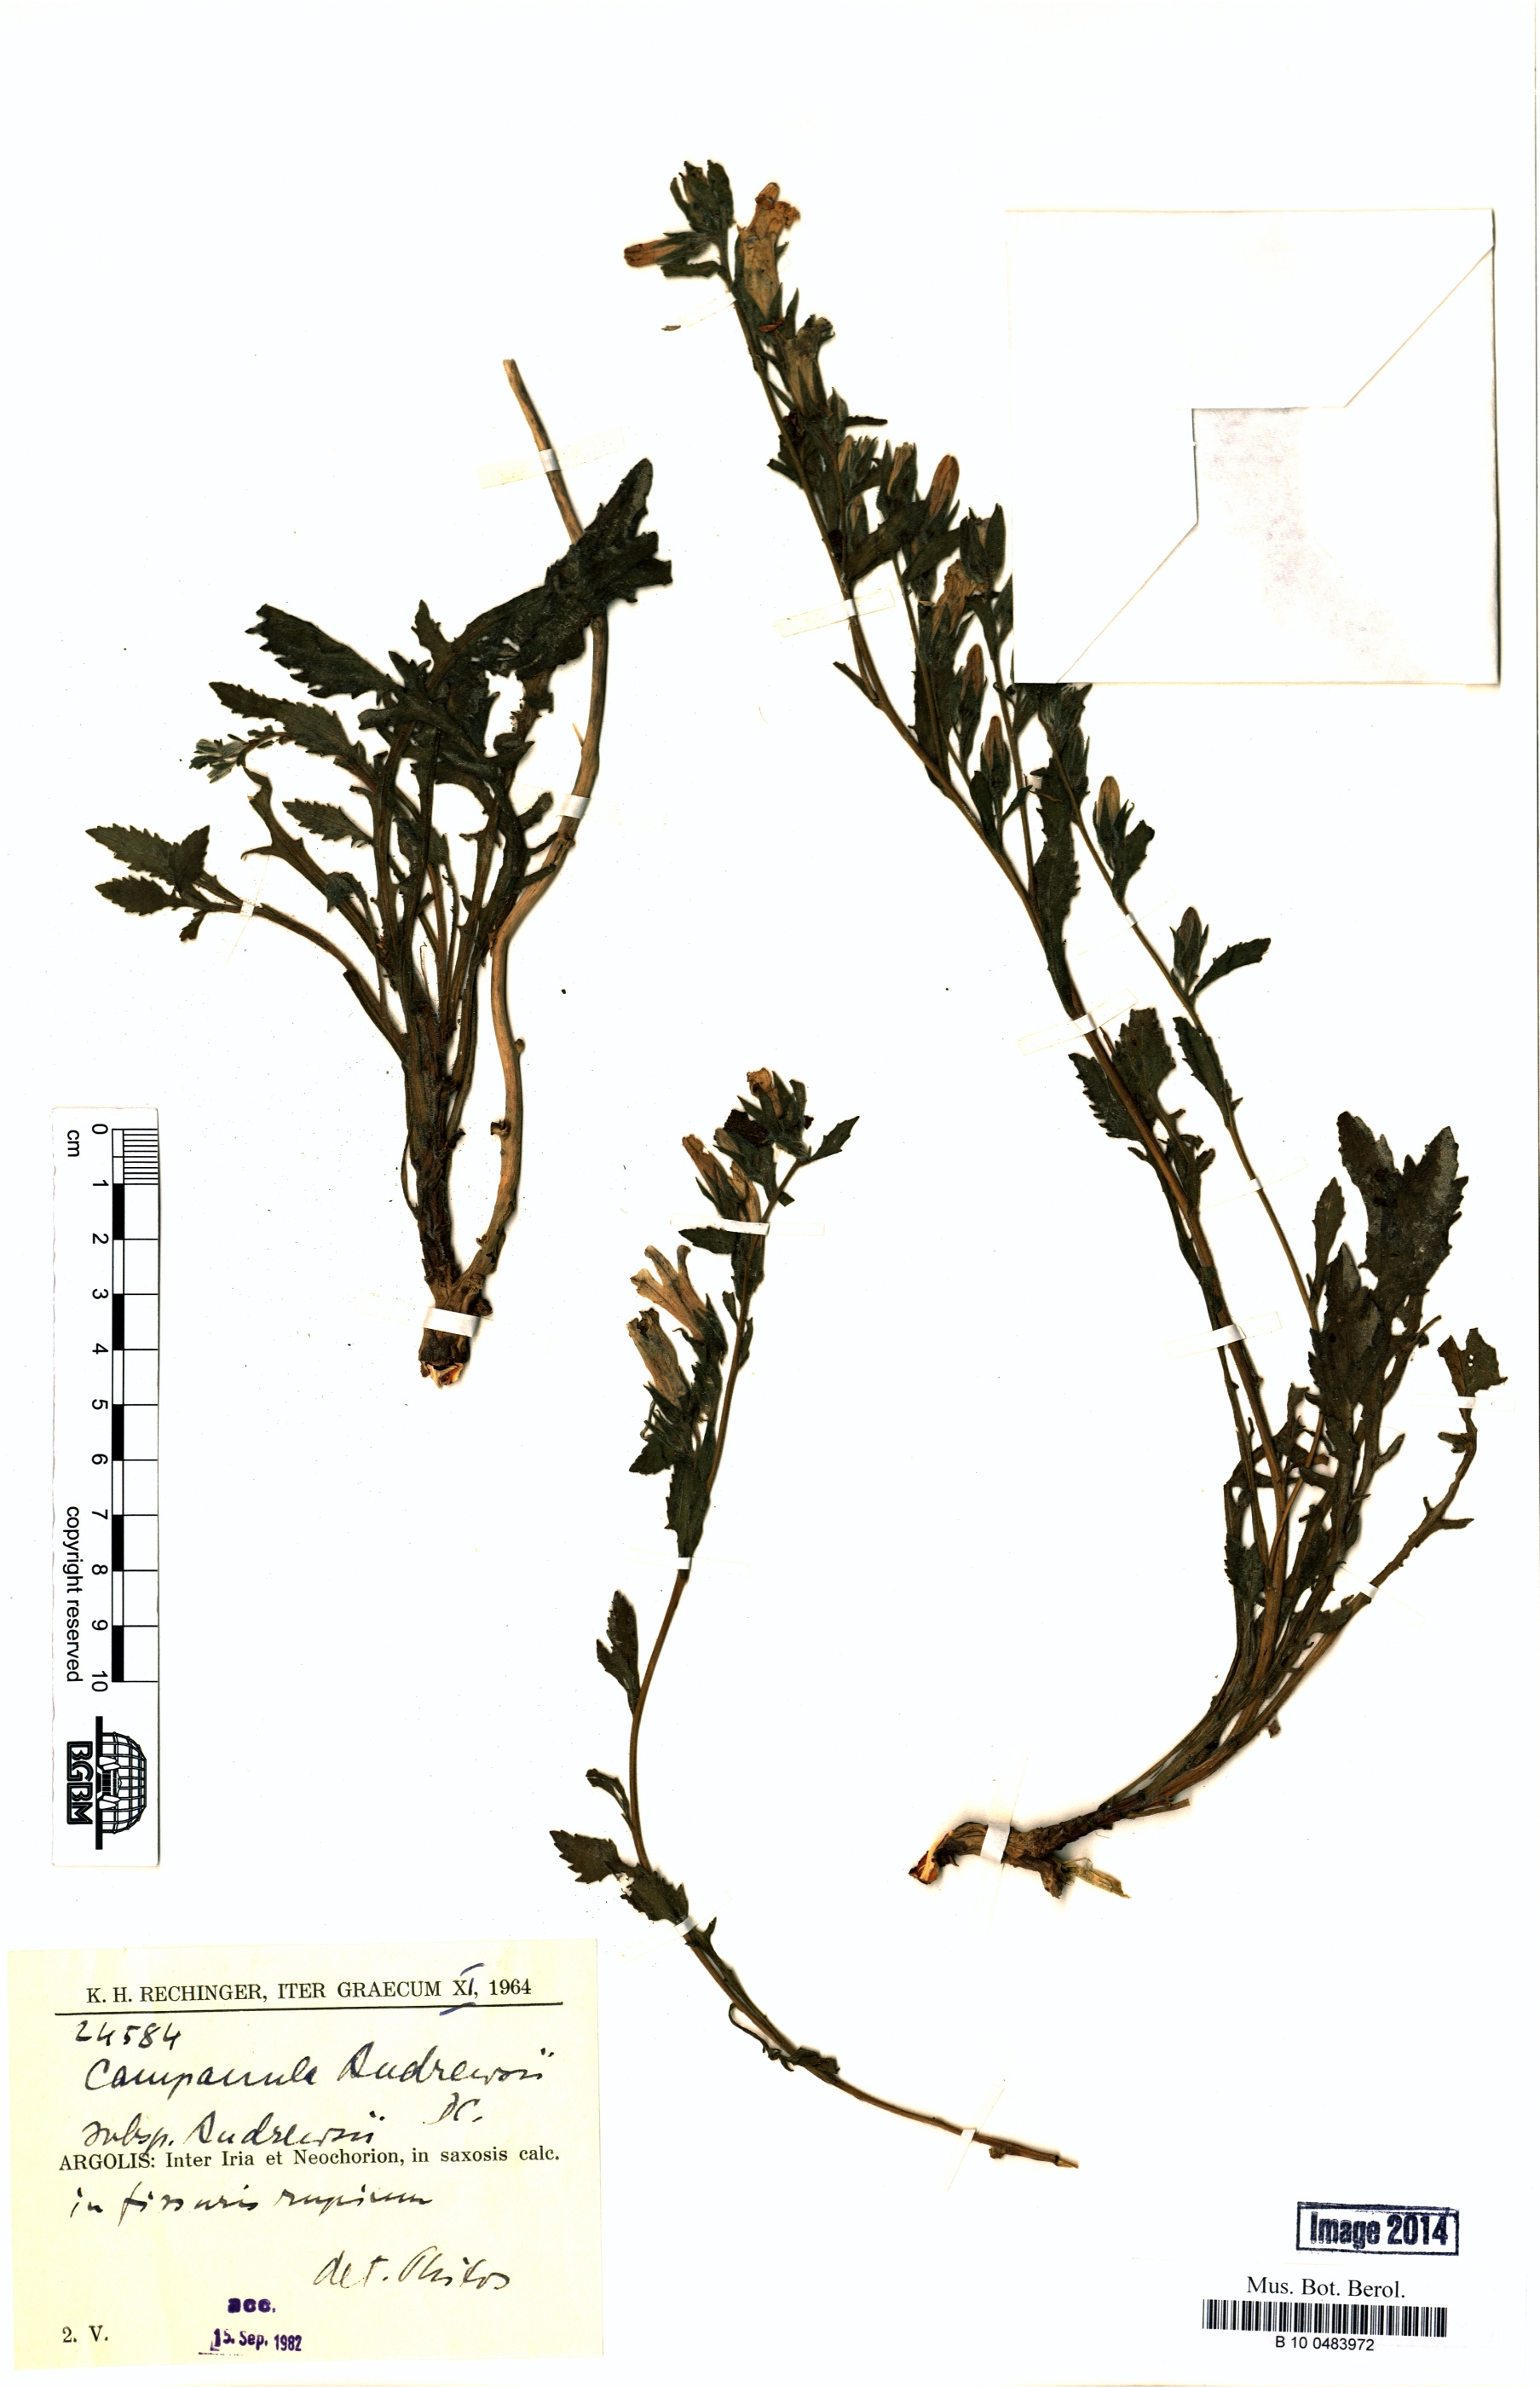 http://ww2.bgbm.org/herbarium/images/B/10/04/83/97/B_10_0483972.jpg